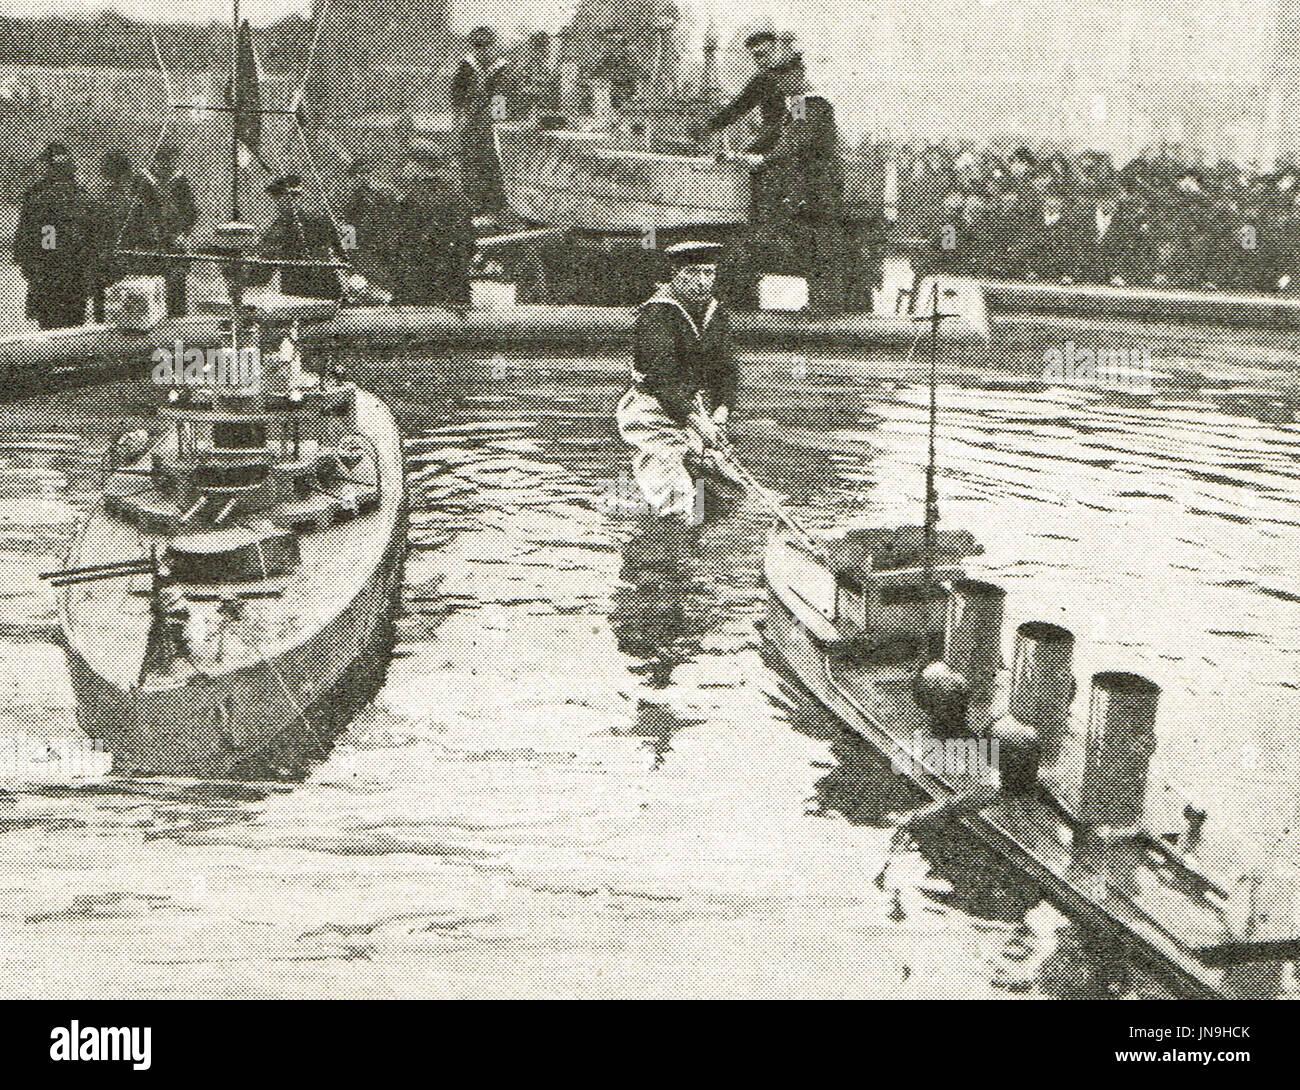 Sailor arranging the miniature fleet, Trafalgar square, 1918 - Stock Image